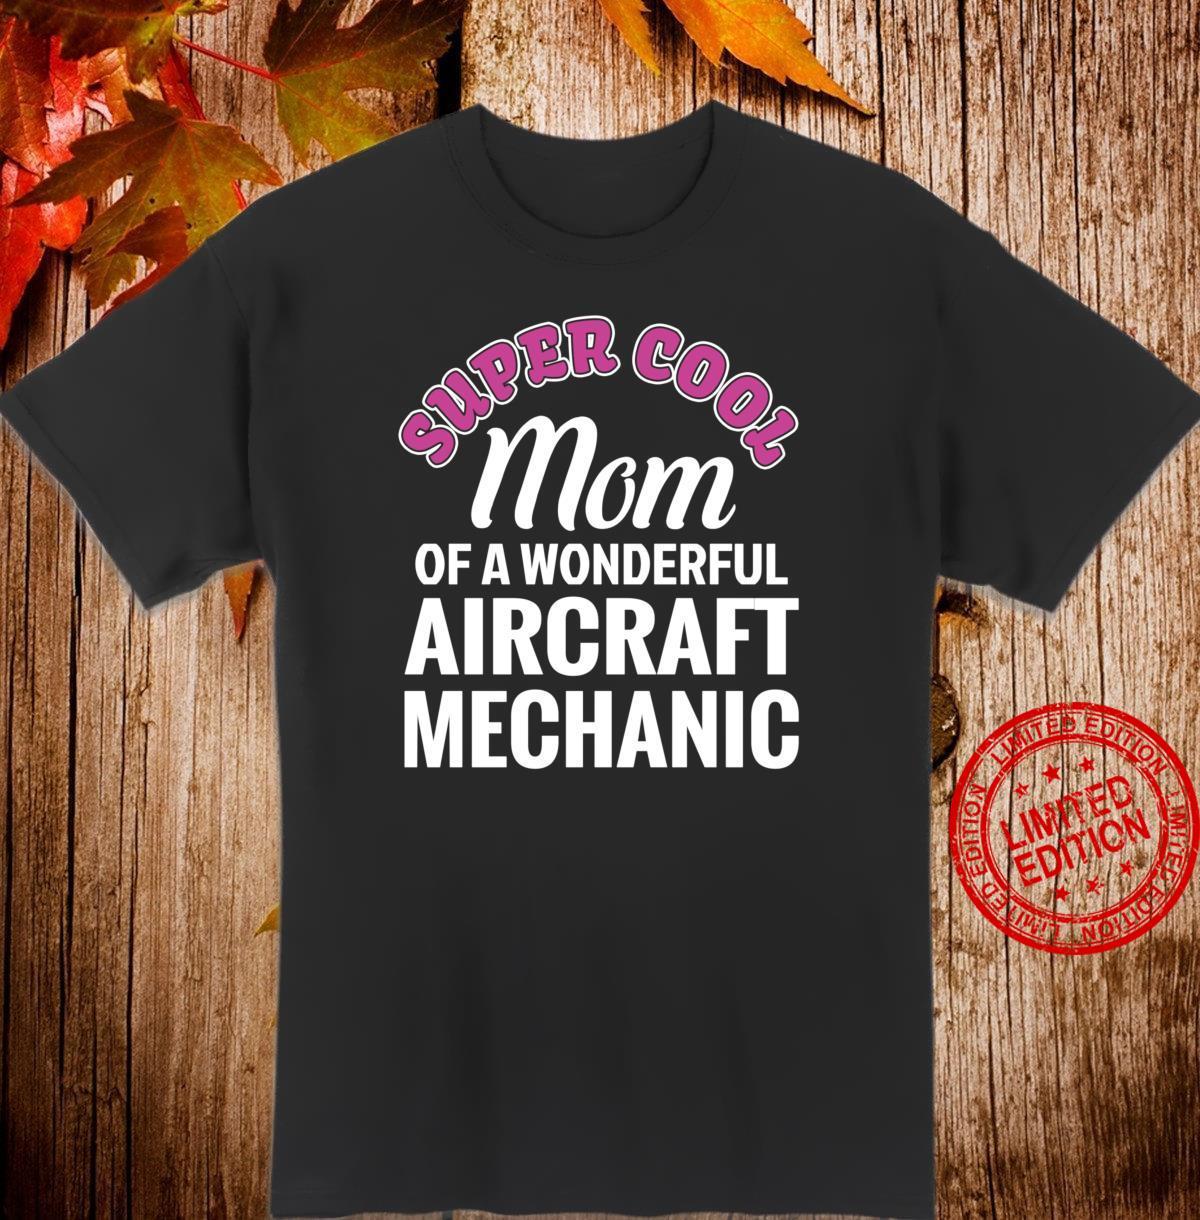 Super Cool Mom of Aircraft Mechanic Shirt